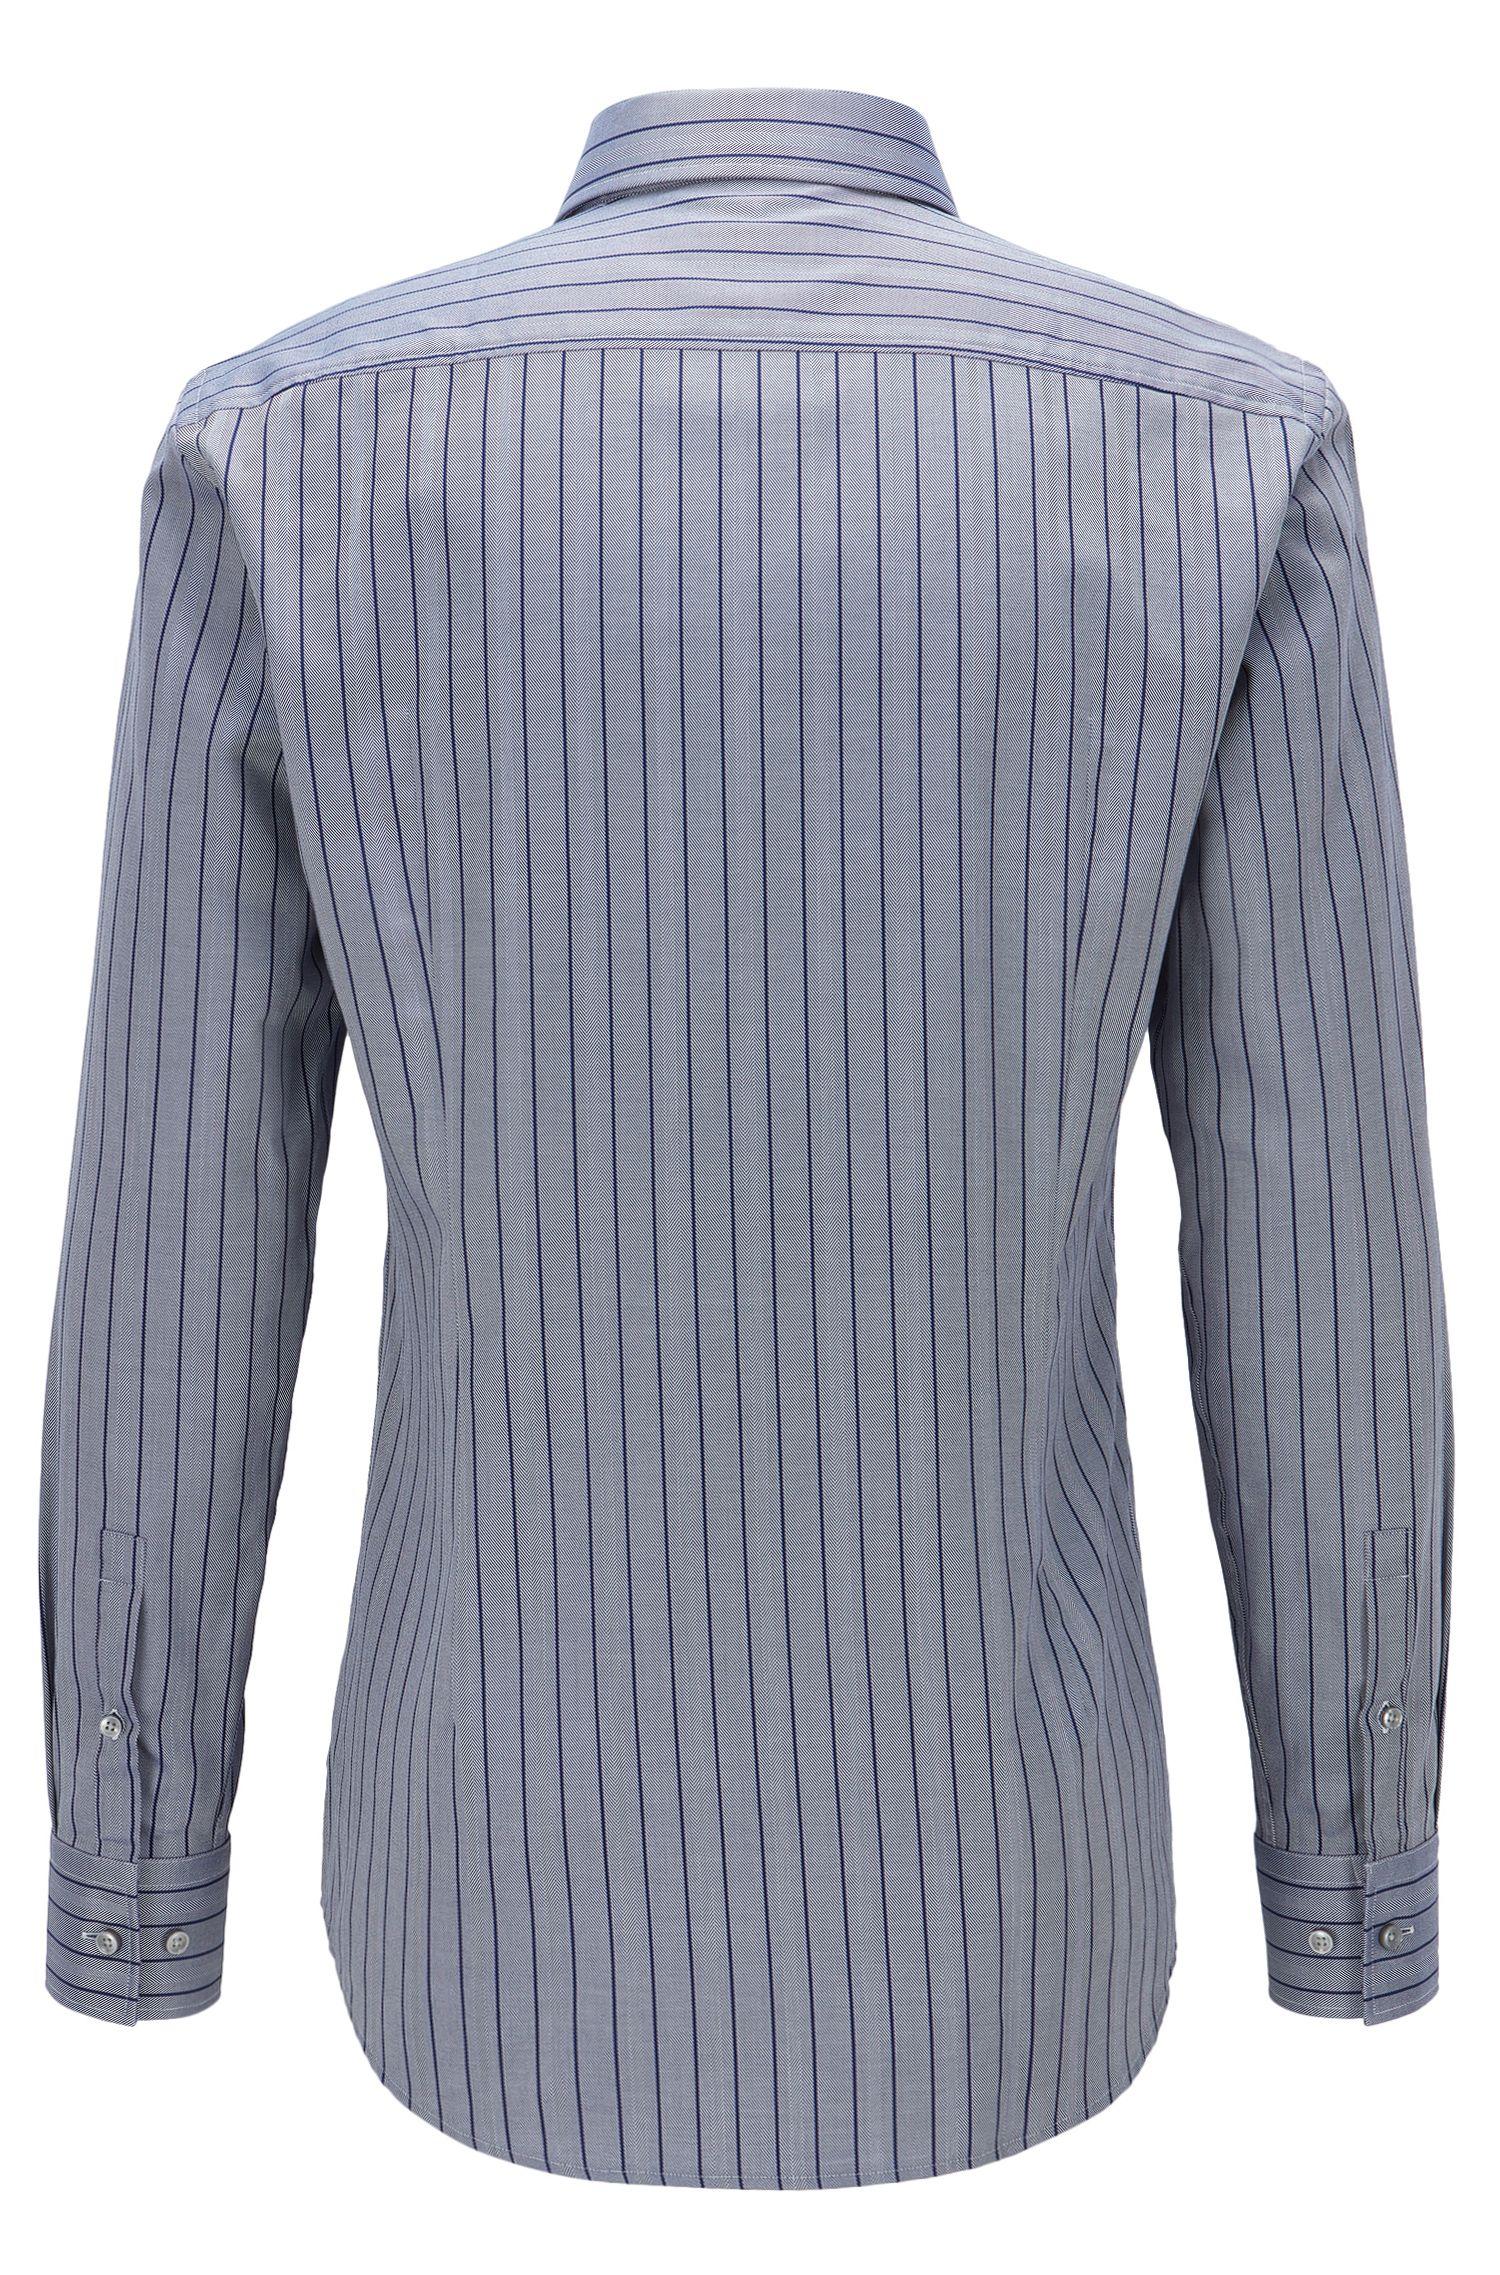 Striped Herringbone Cotton Dress Shirt, Slim Fit | Jason